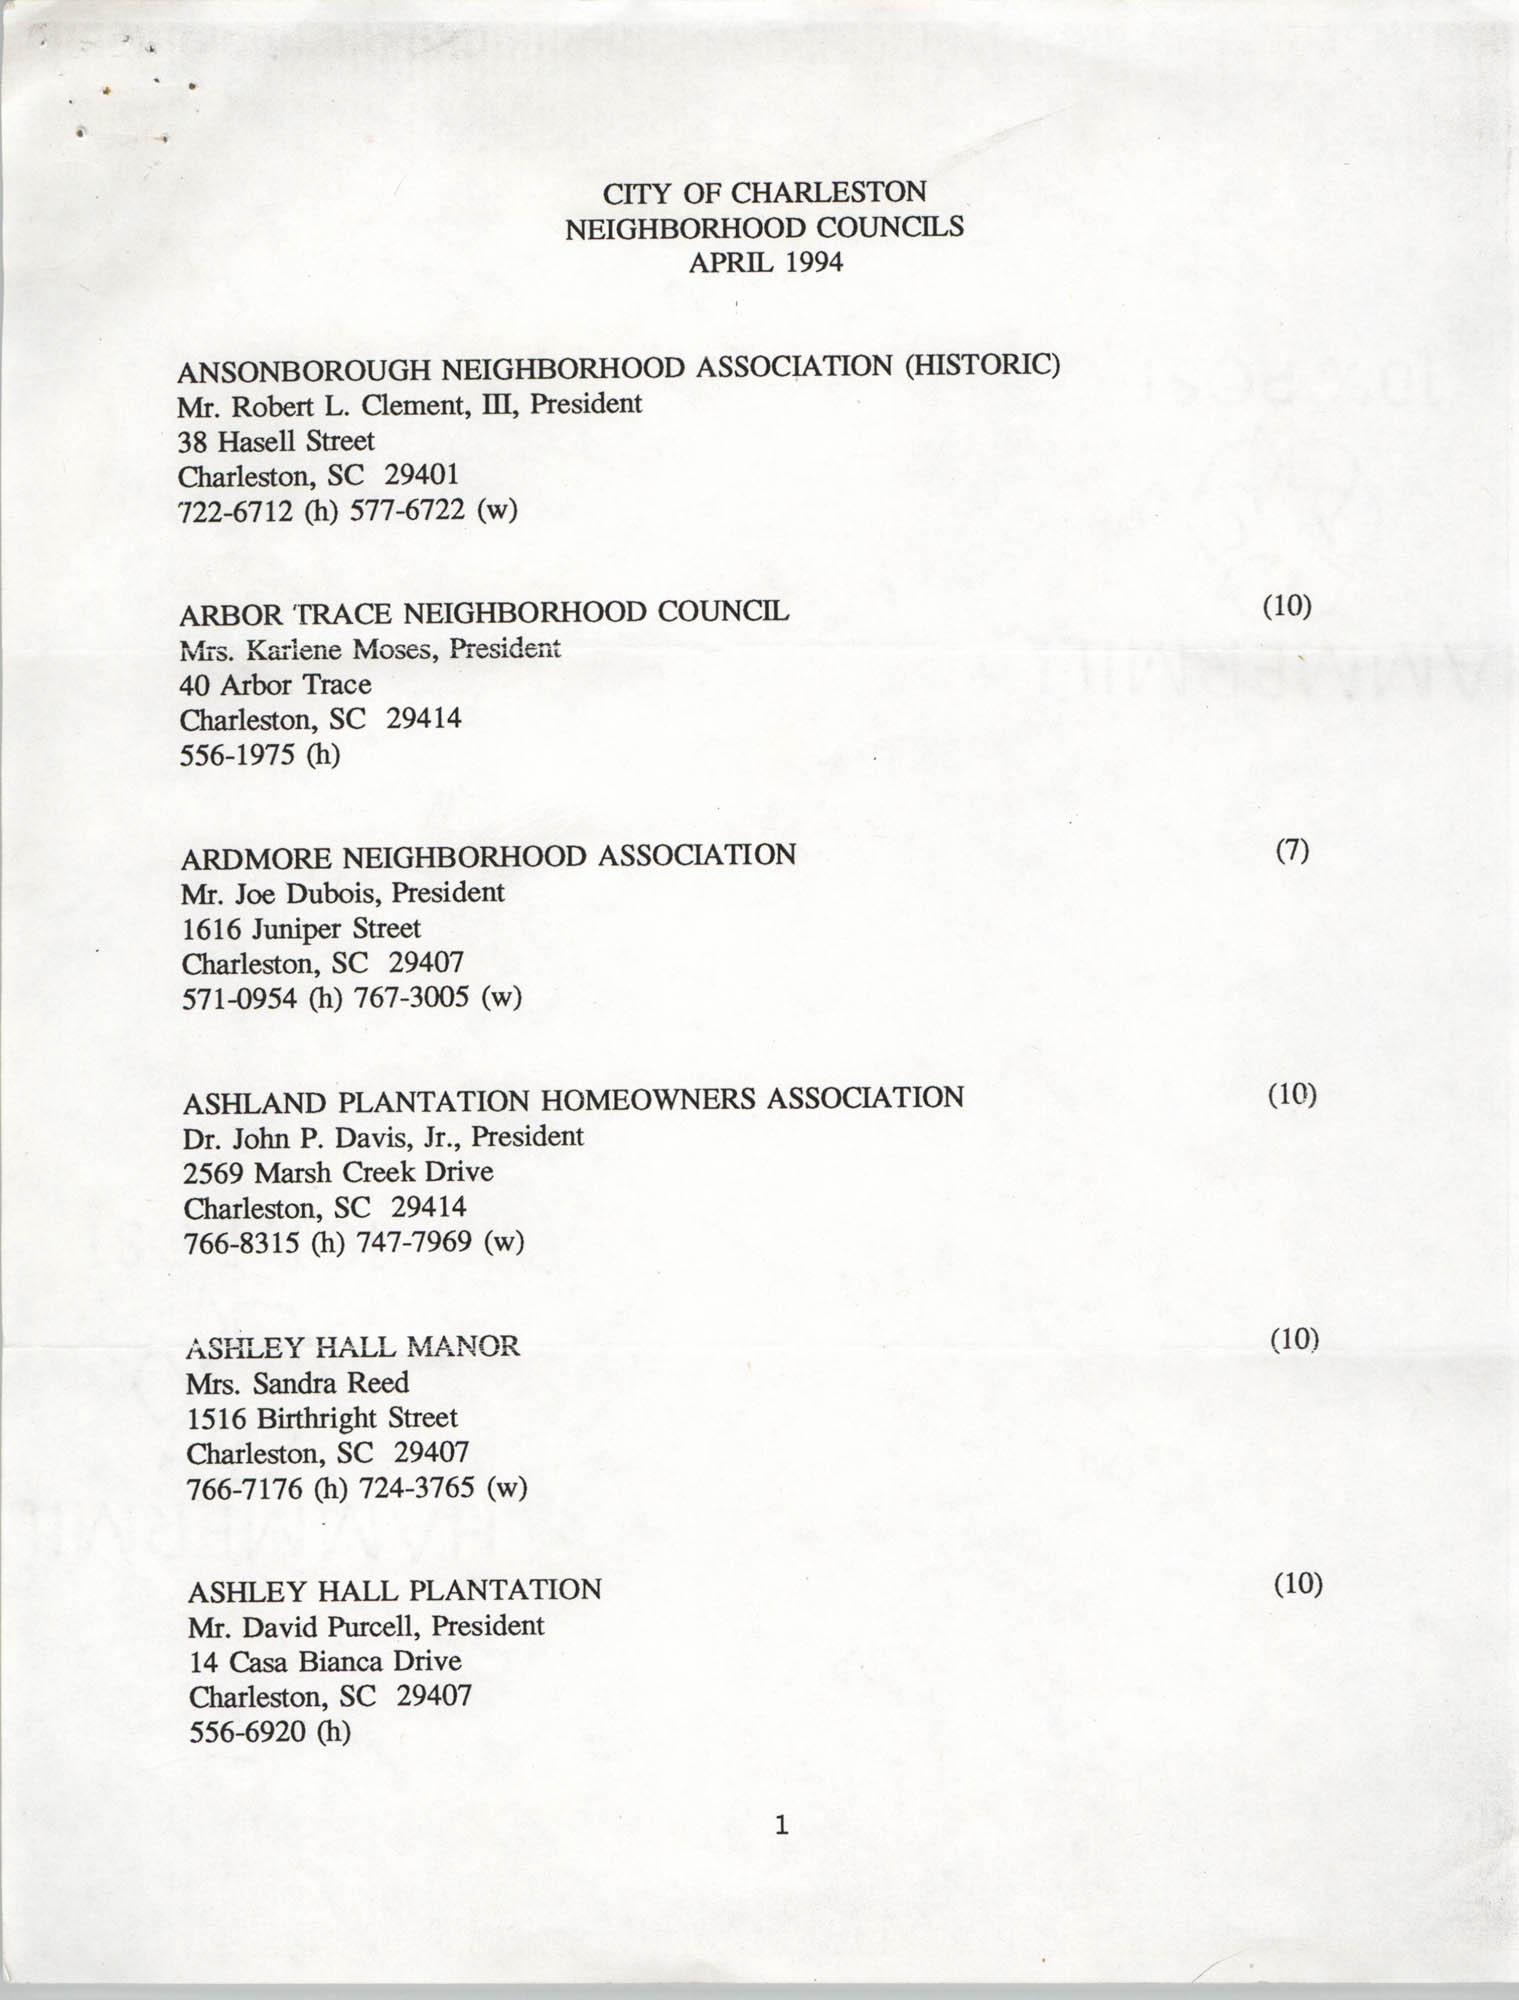 City of Charleston Neighborhood Councils, April 1994, Page 1